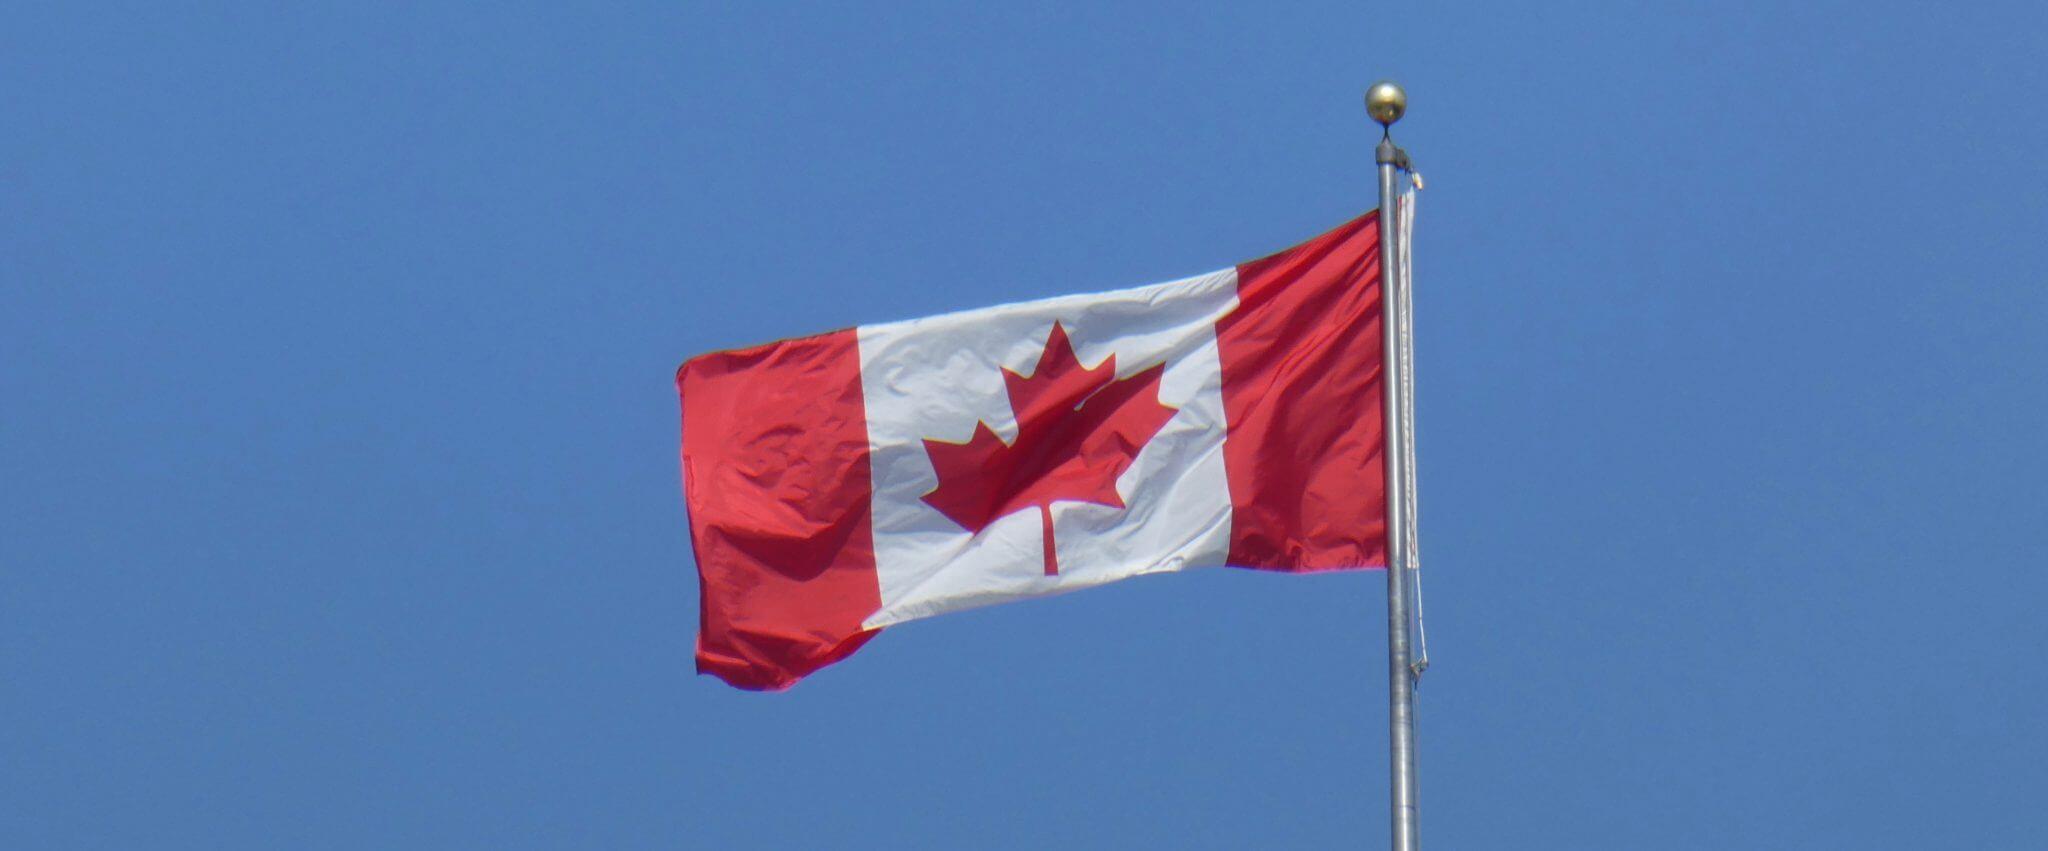 Envie de vivre au Canada